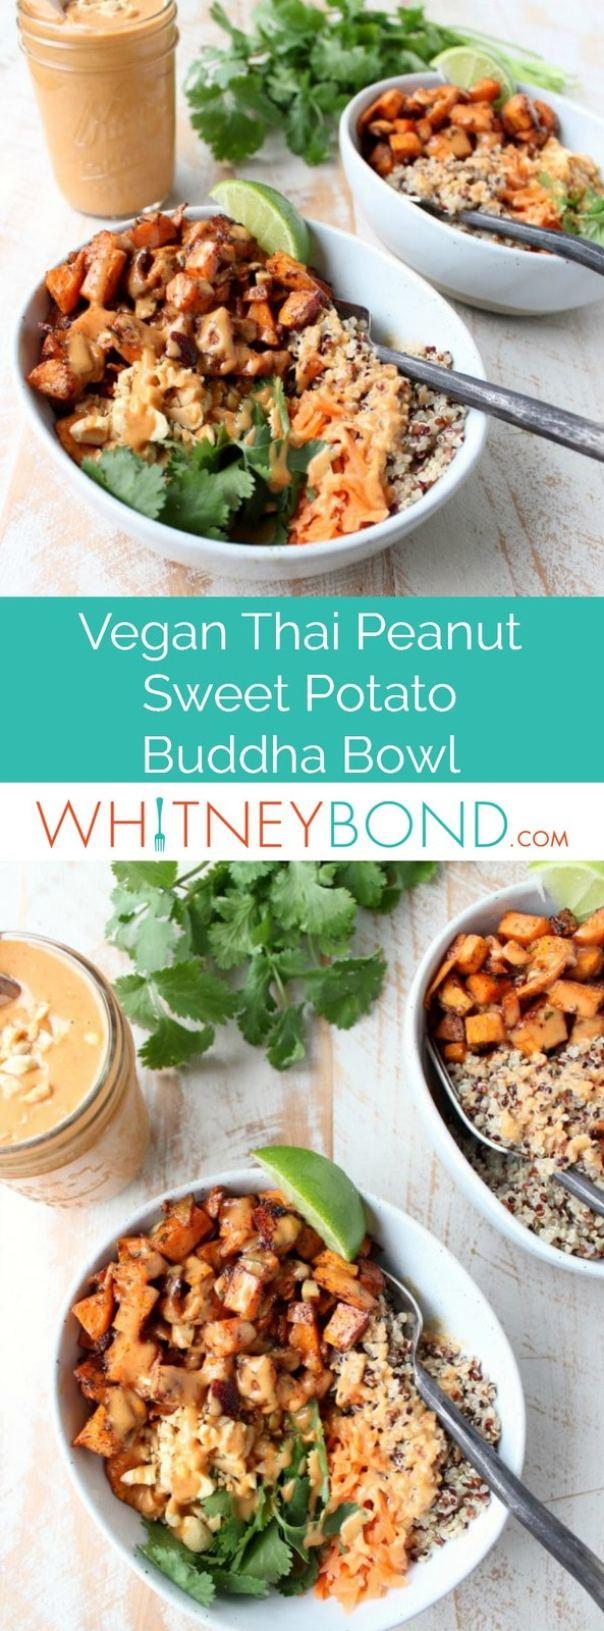 Thai Peanut Sweet Potato Buddha Bowl Recipe - WhitneyBond.com